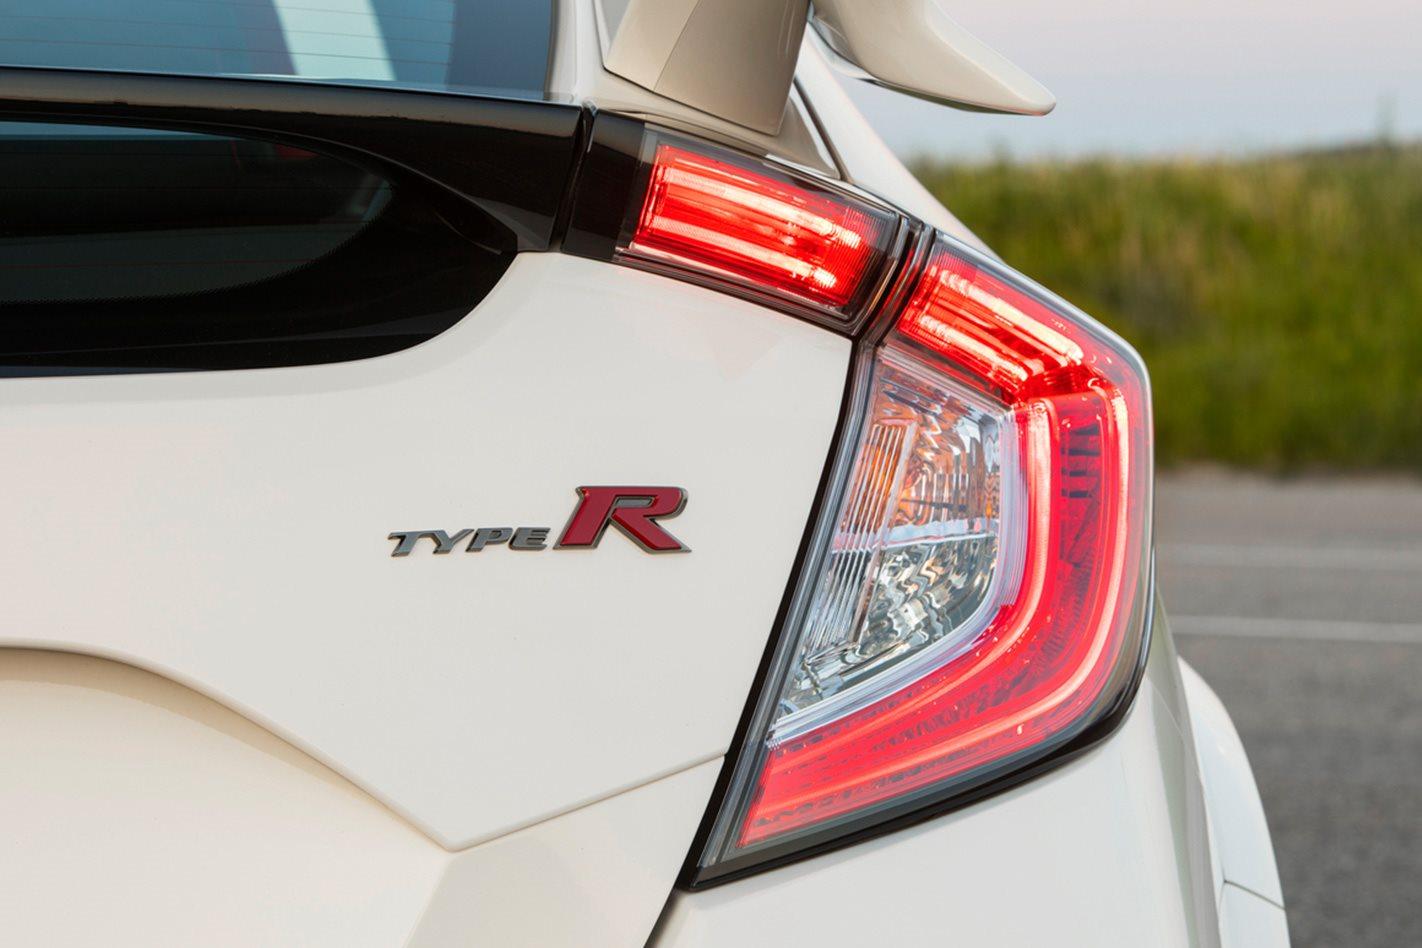 Honda Civic Type R badge